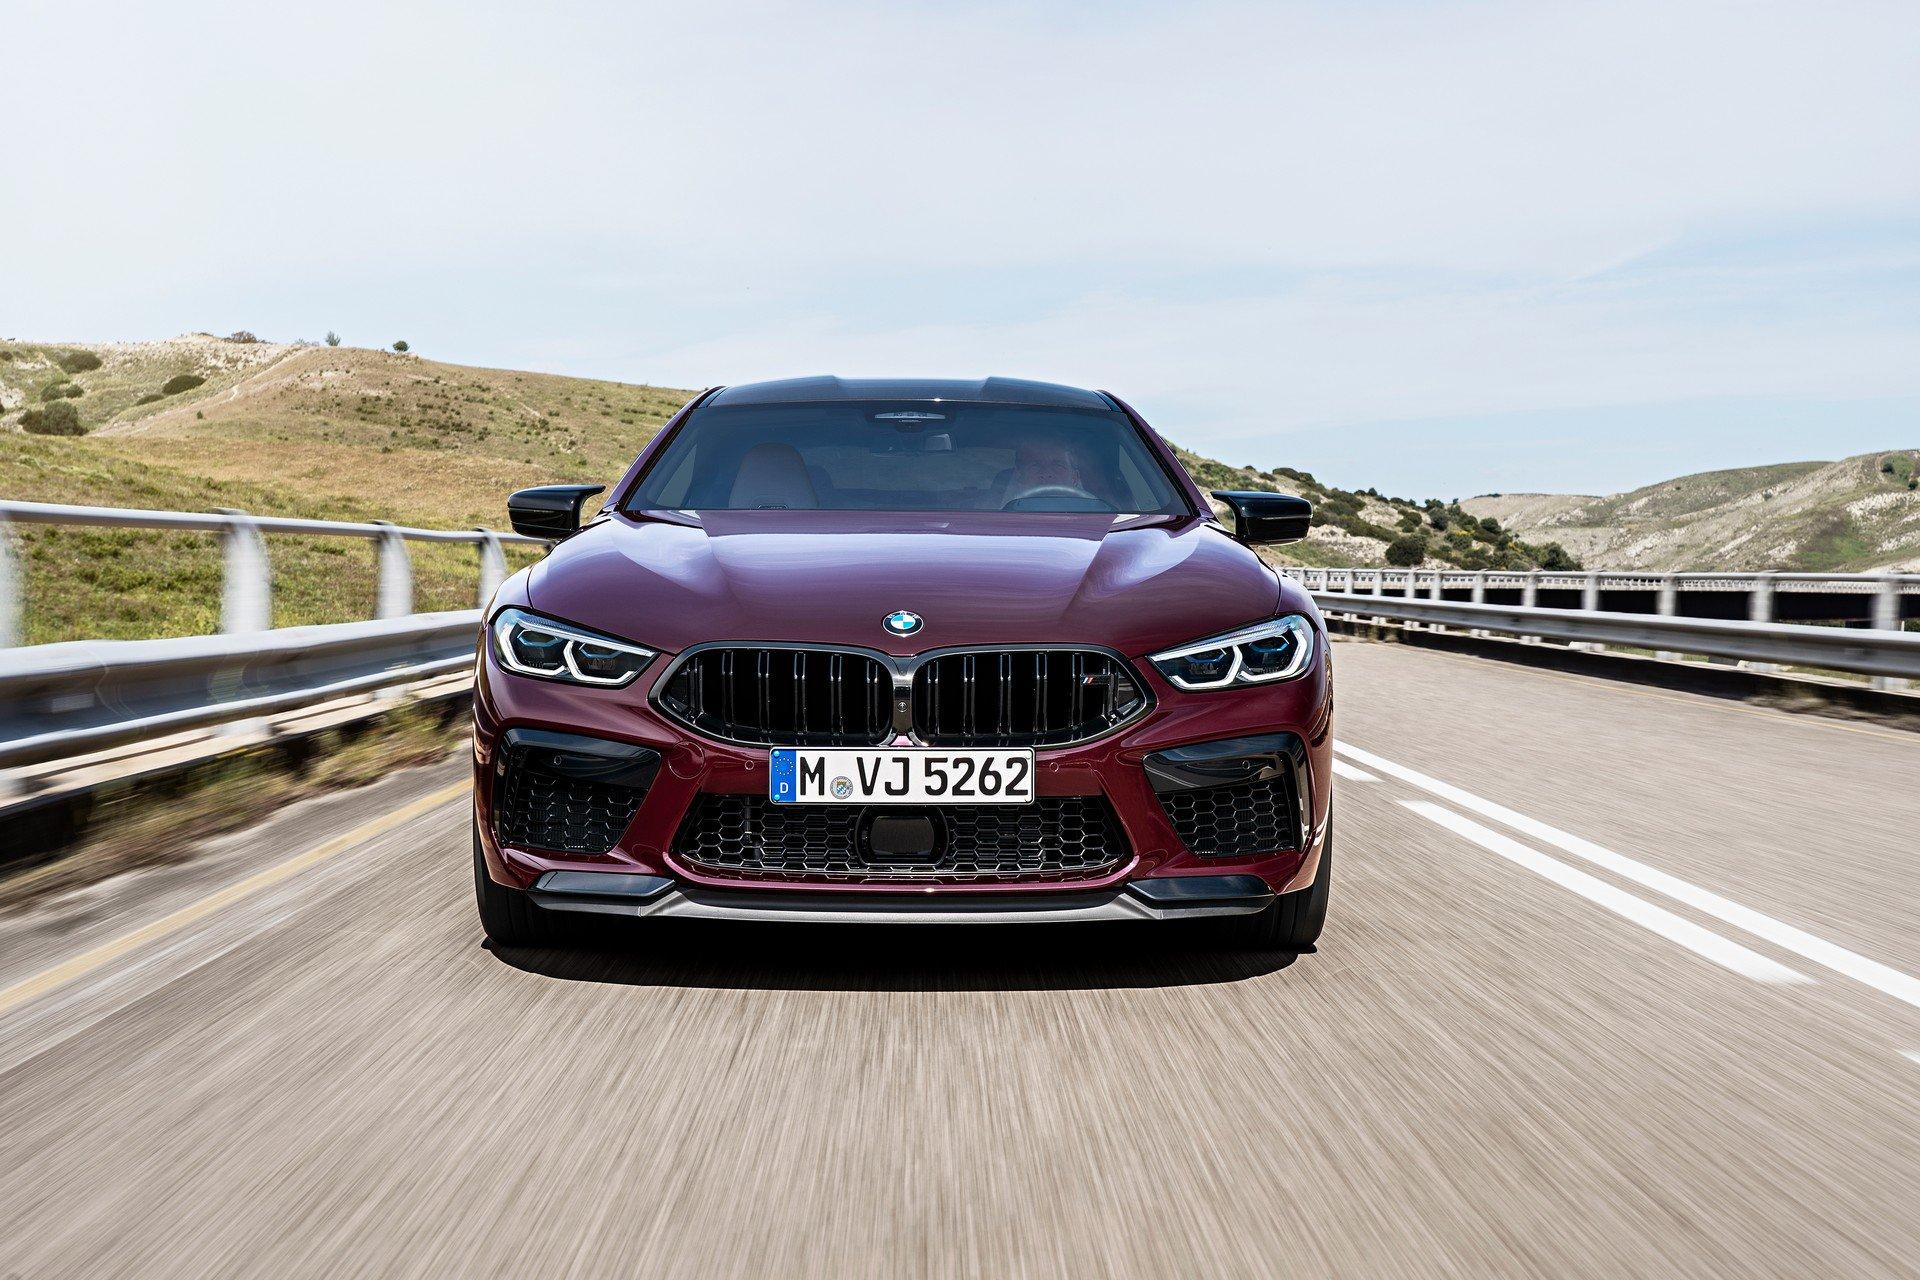 2020-bmw-m8-gran-coupe-2.jpg